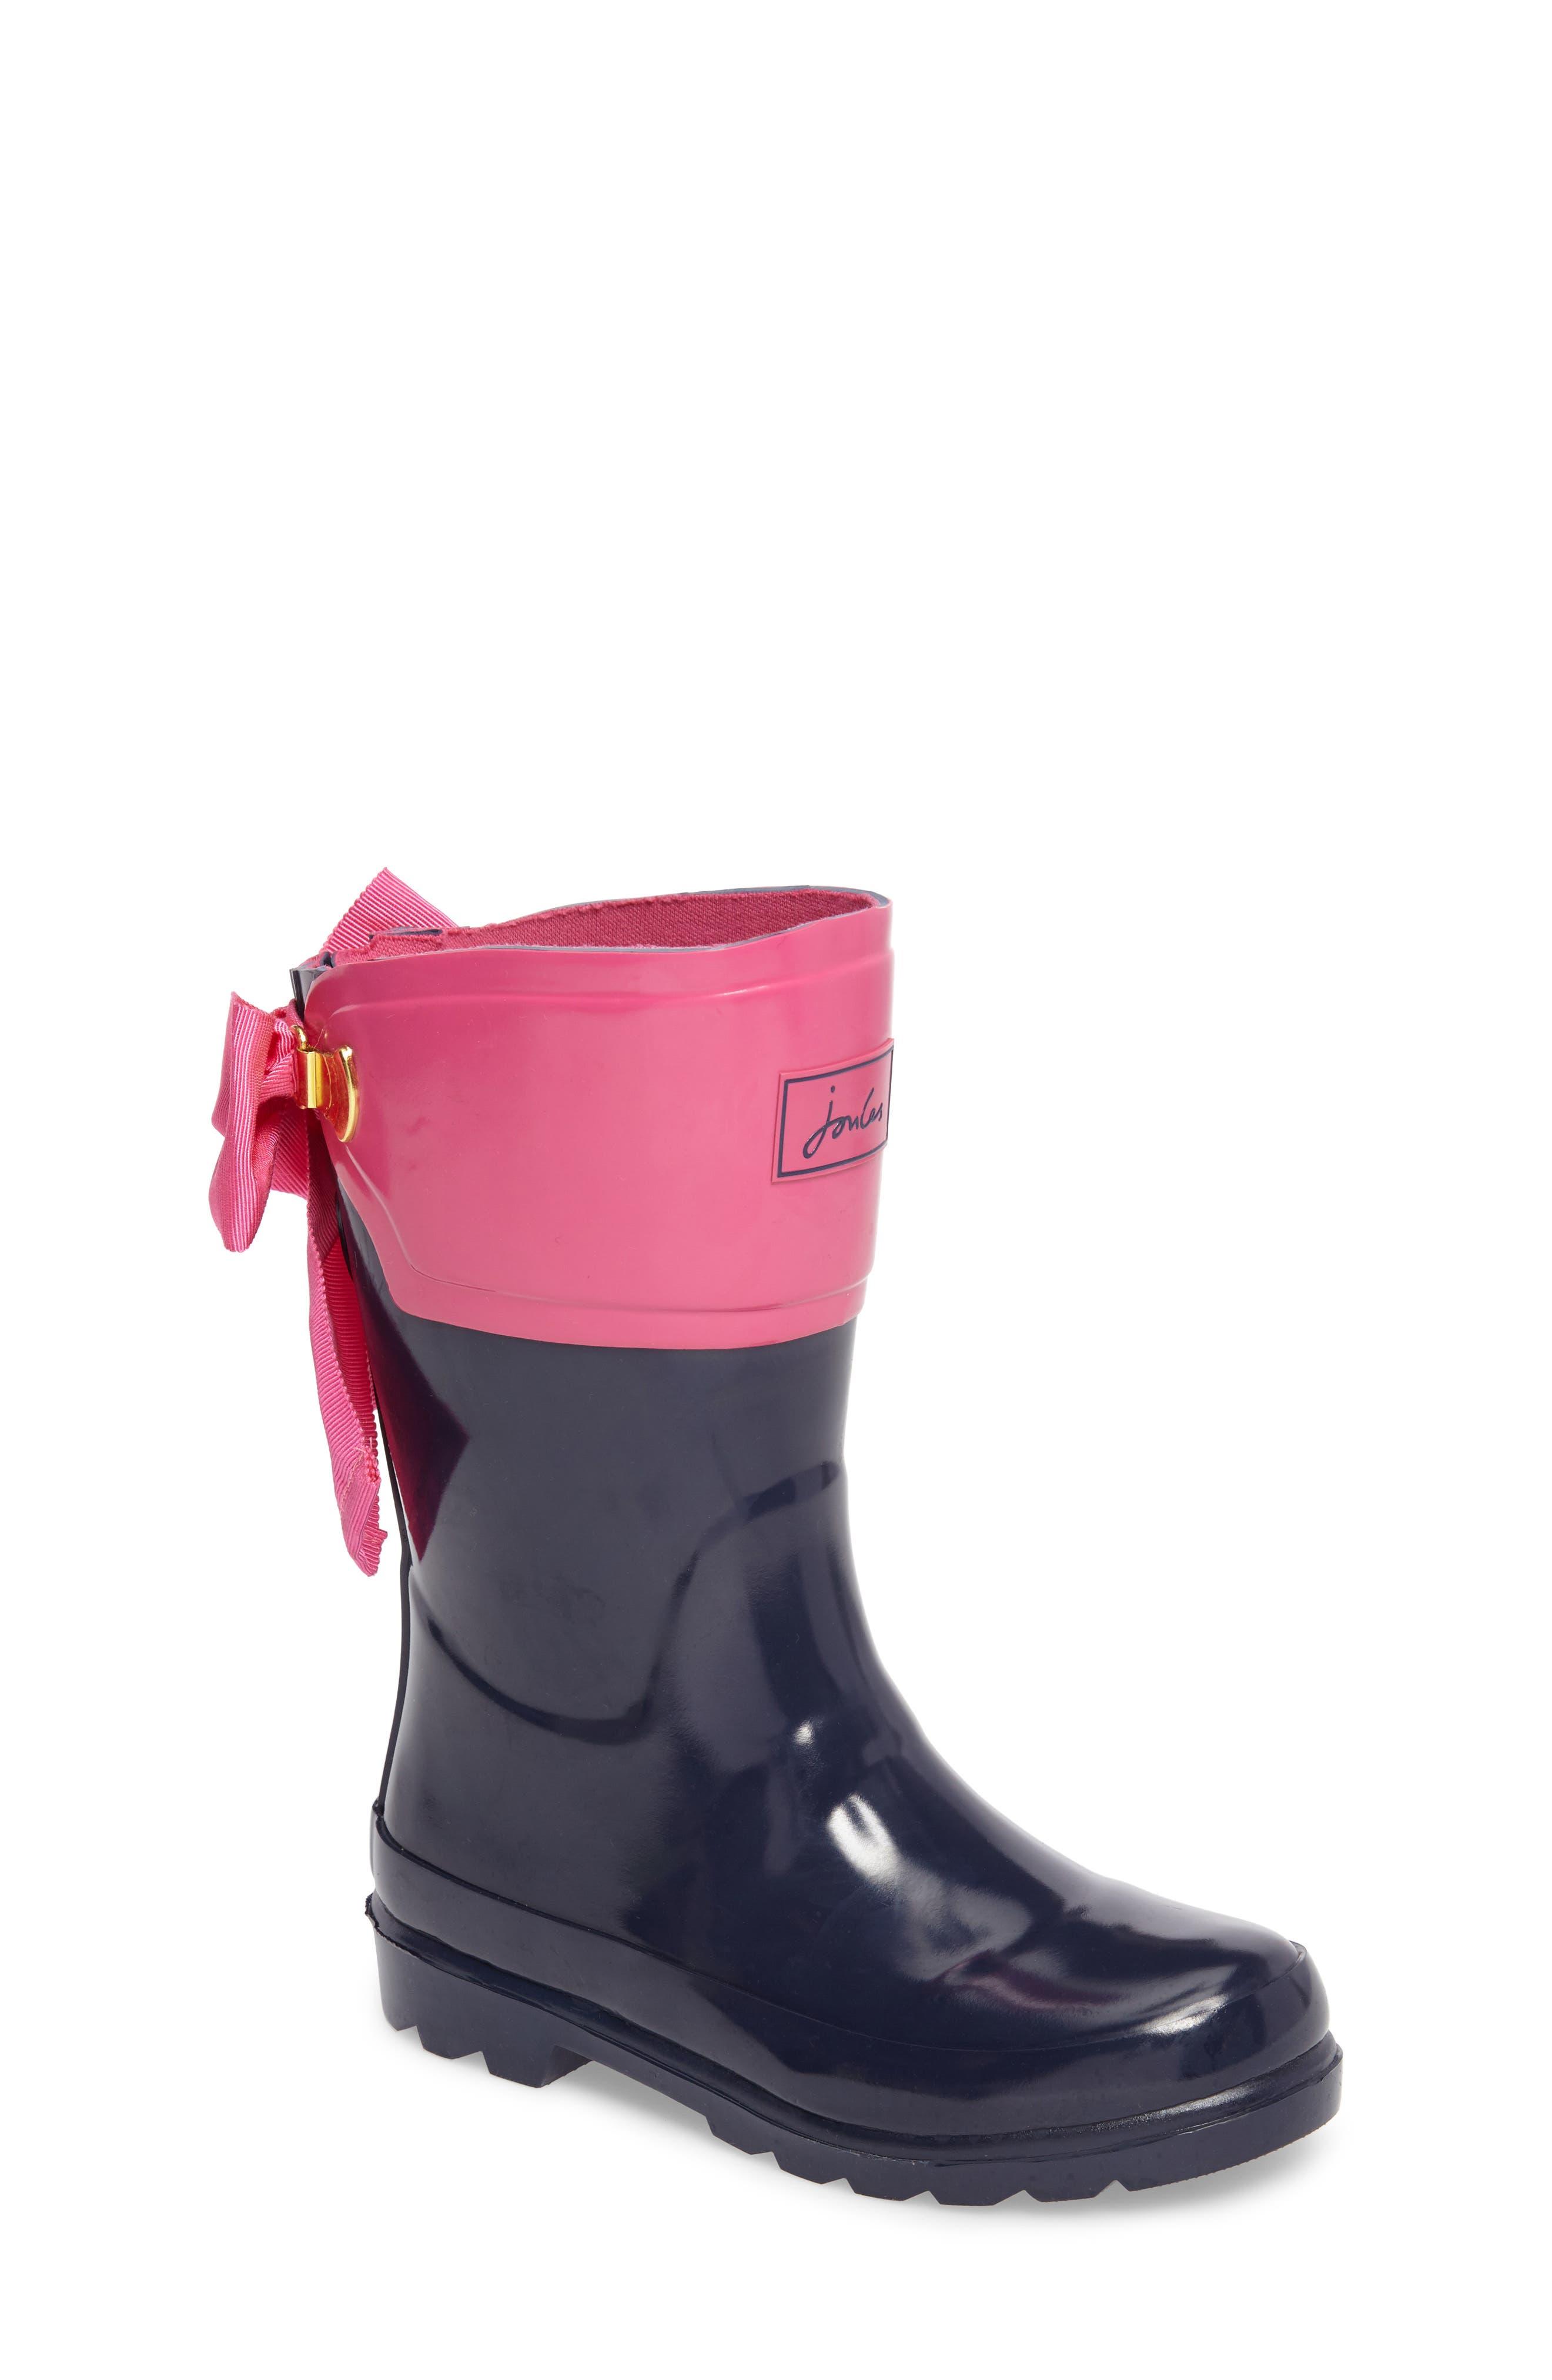 Evedon Bow Waterproof Rain Boot,                         Main,                         color, 400